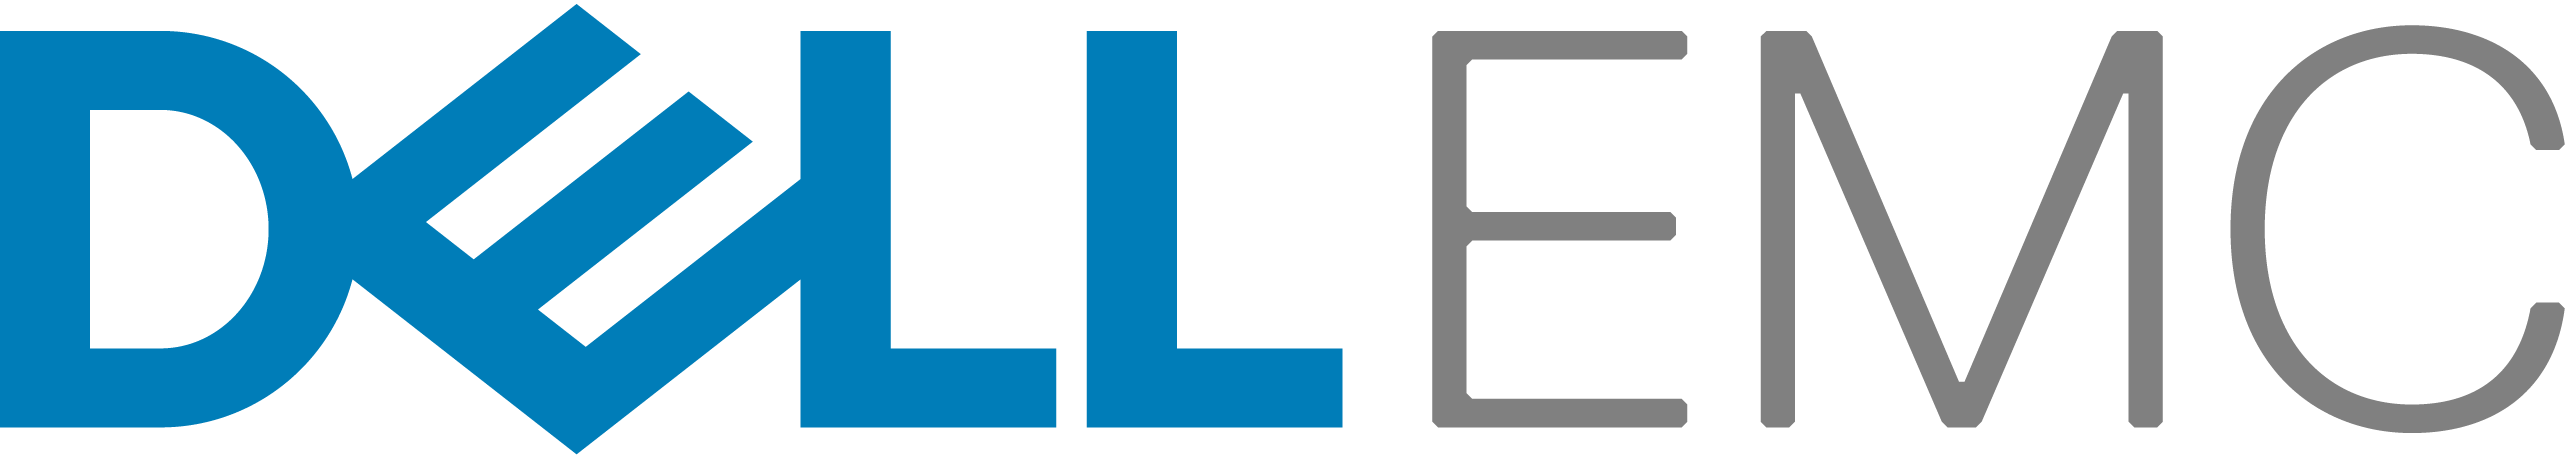 ItVoice | Online IT Magazine India » Dell EMC Expands Server